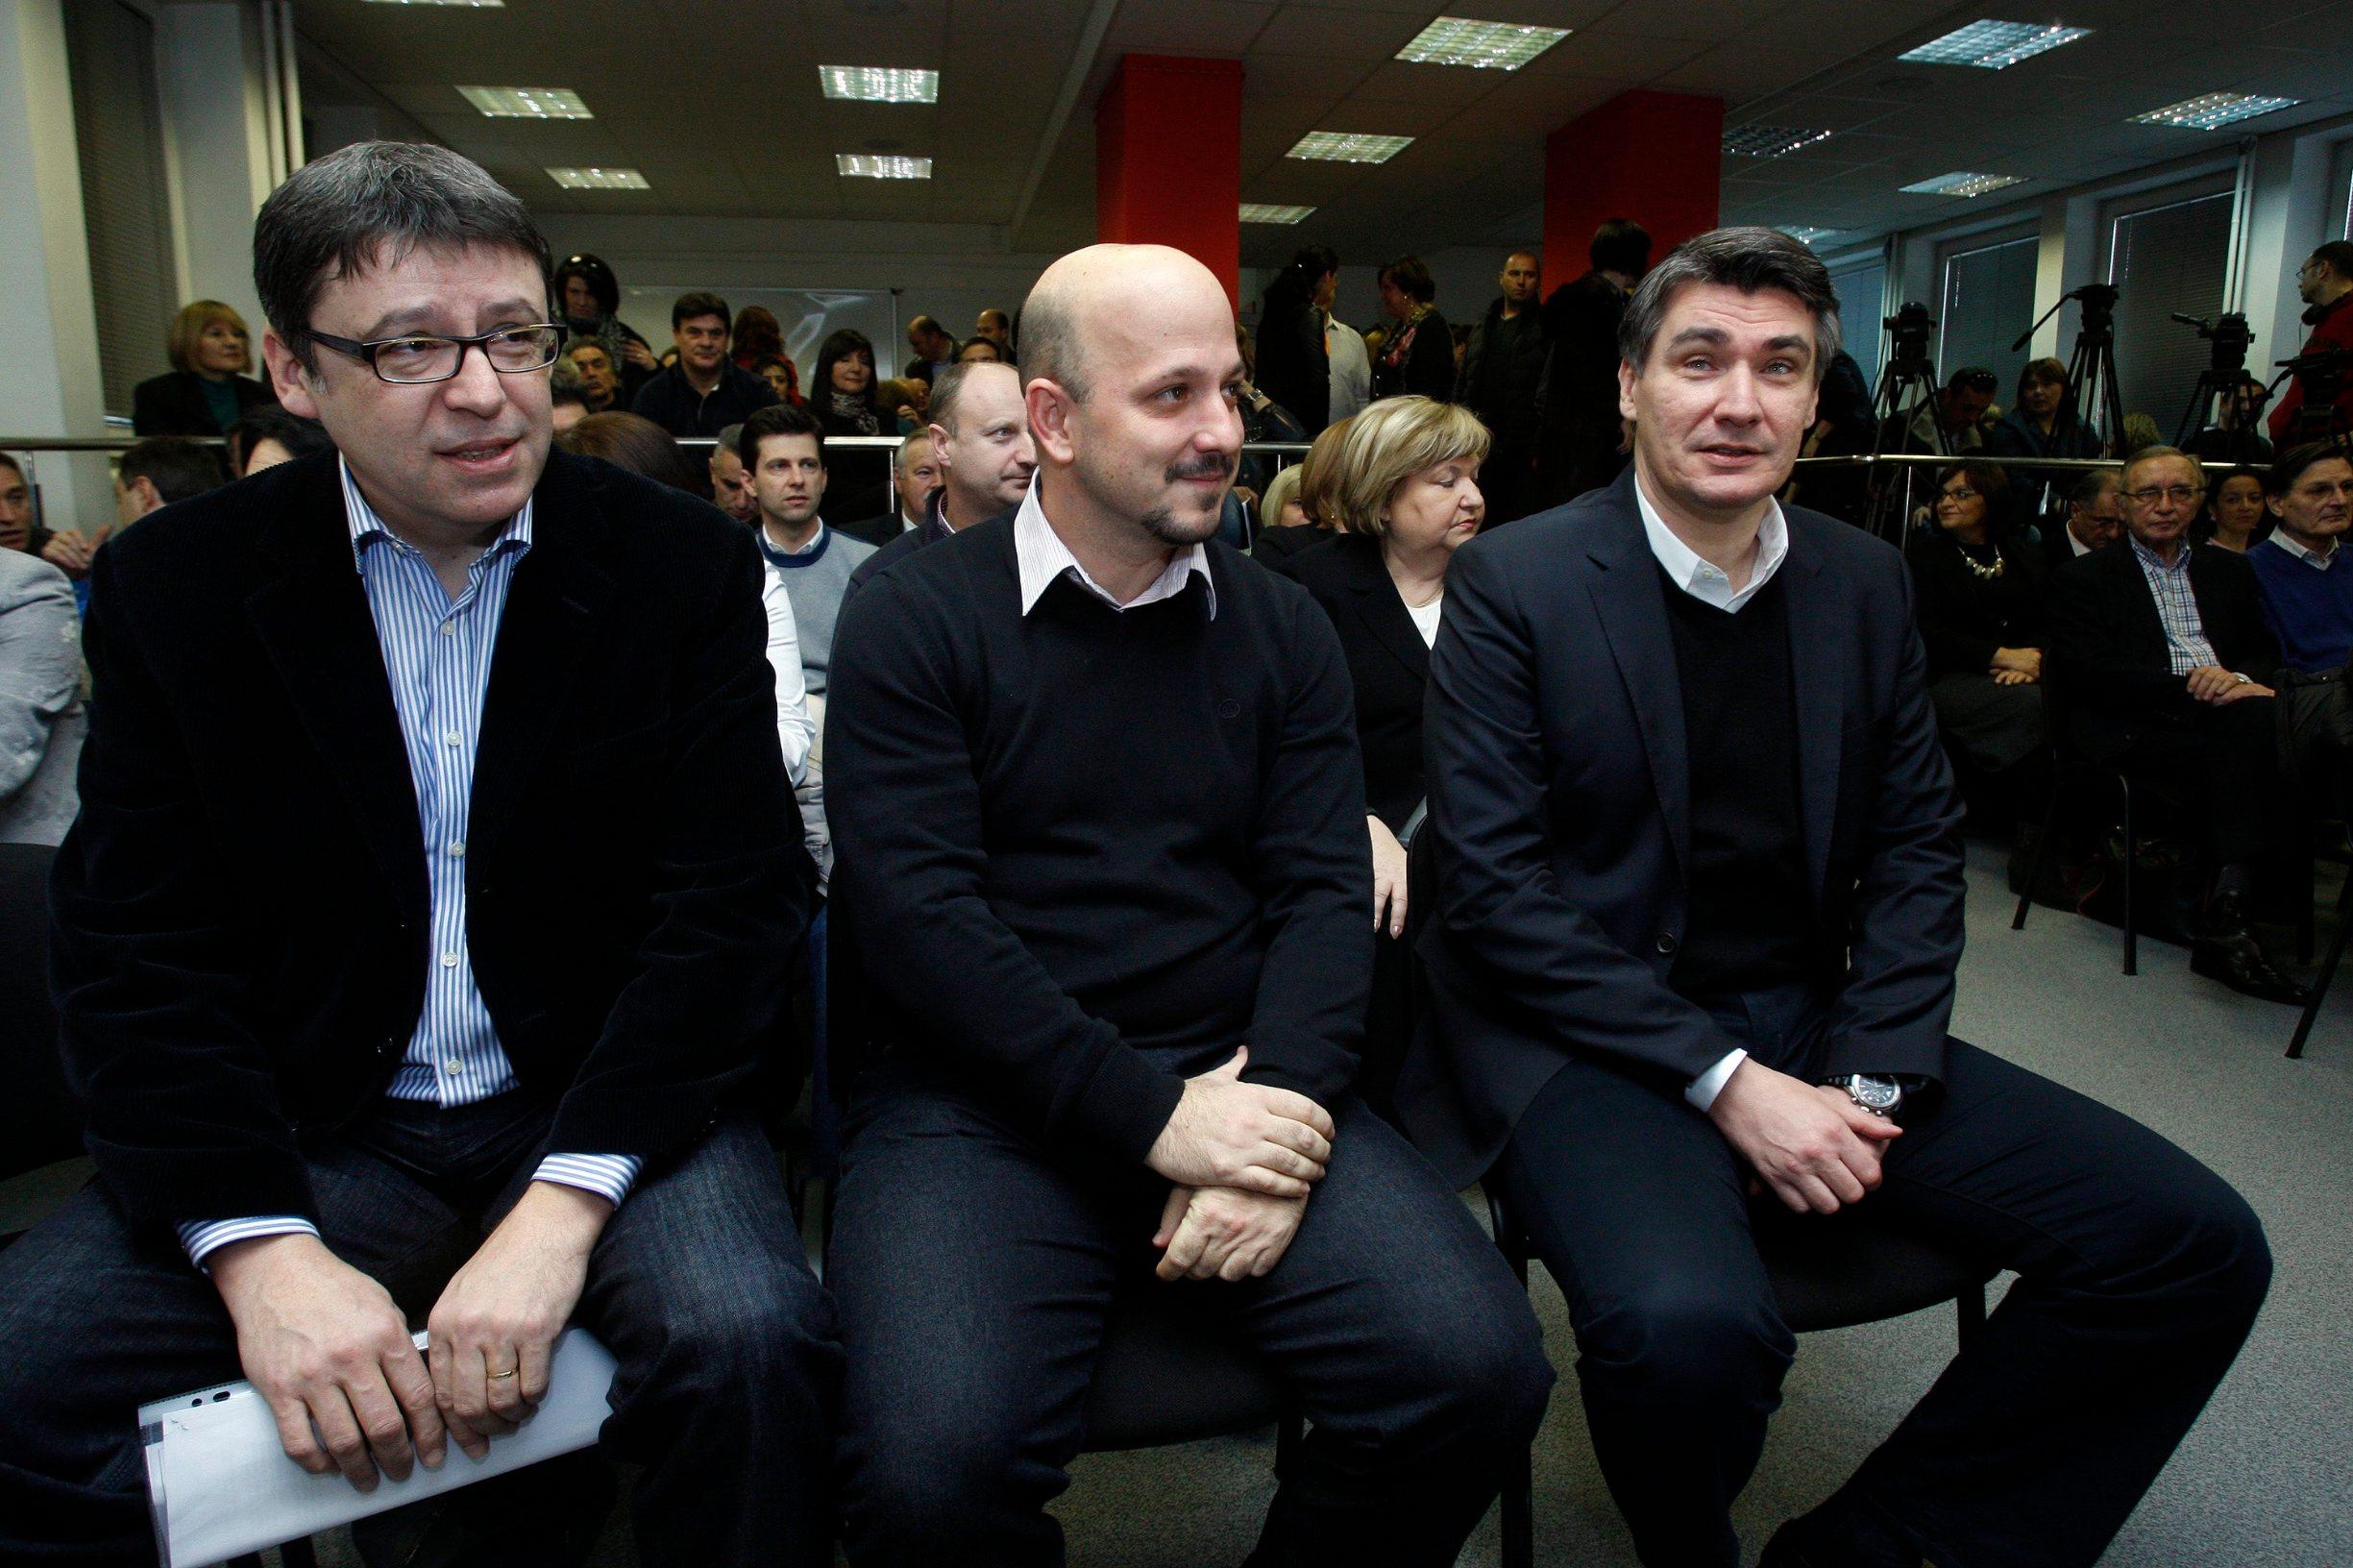 Željko Jovanović, Gordan Maras, Zoran Milanović